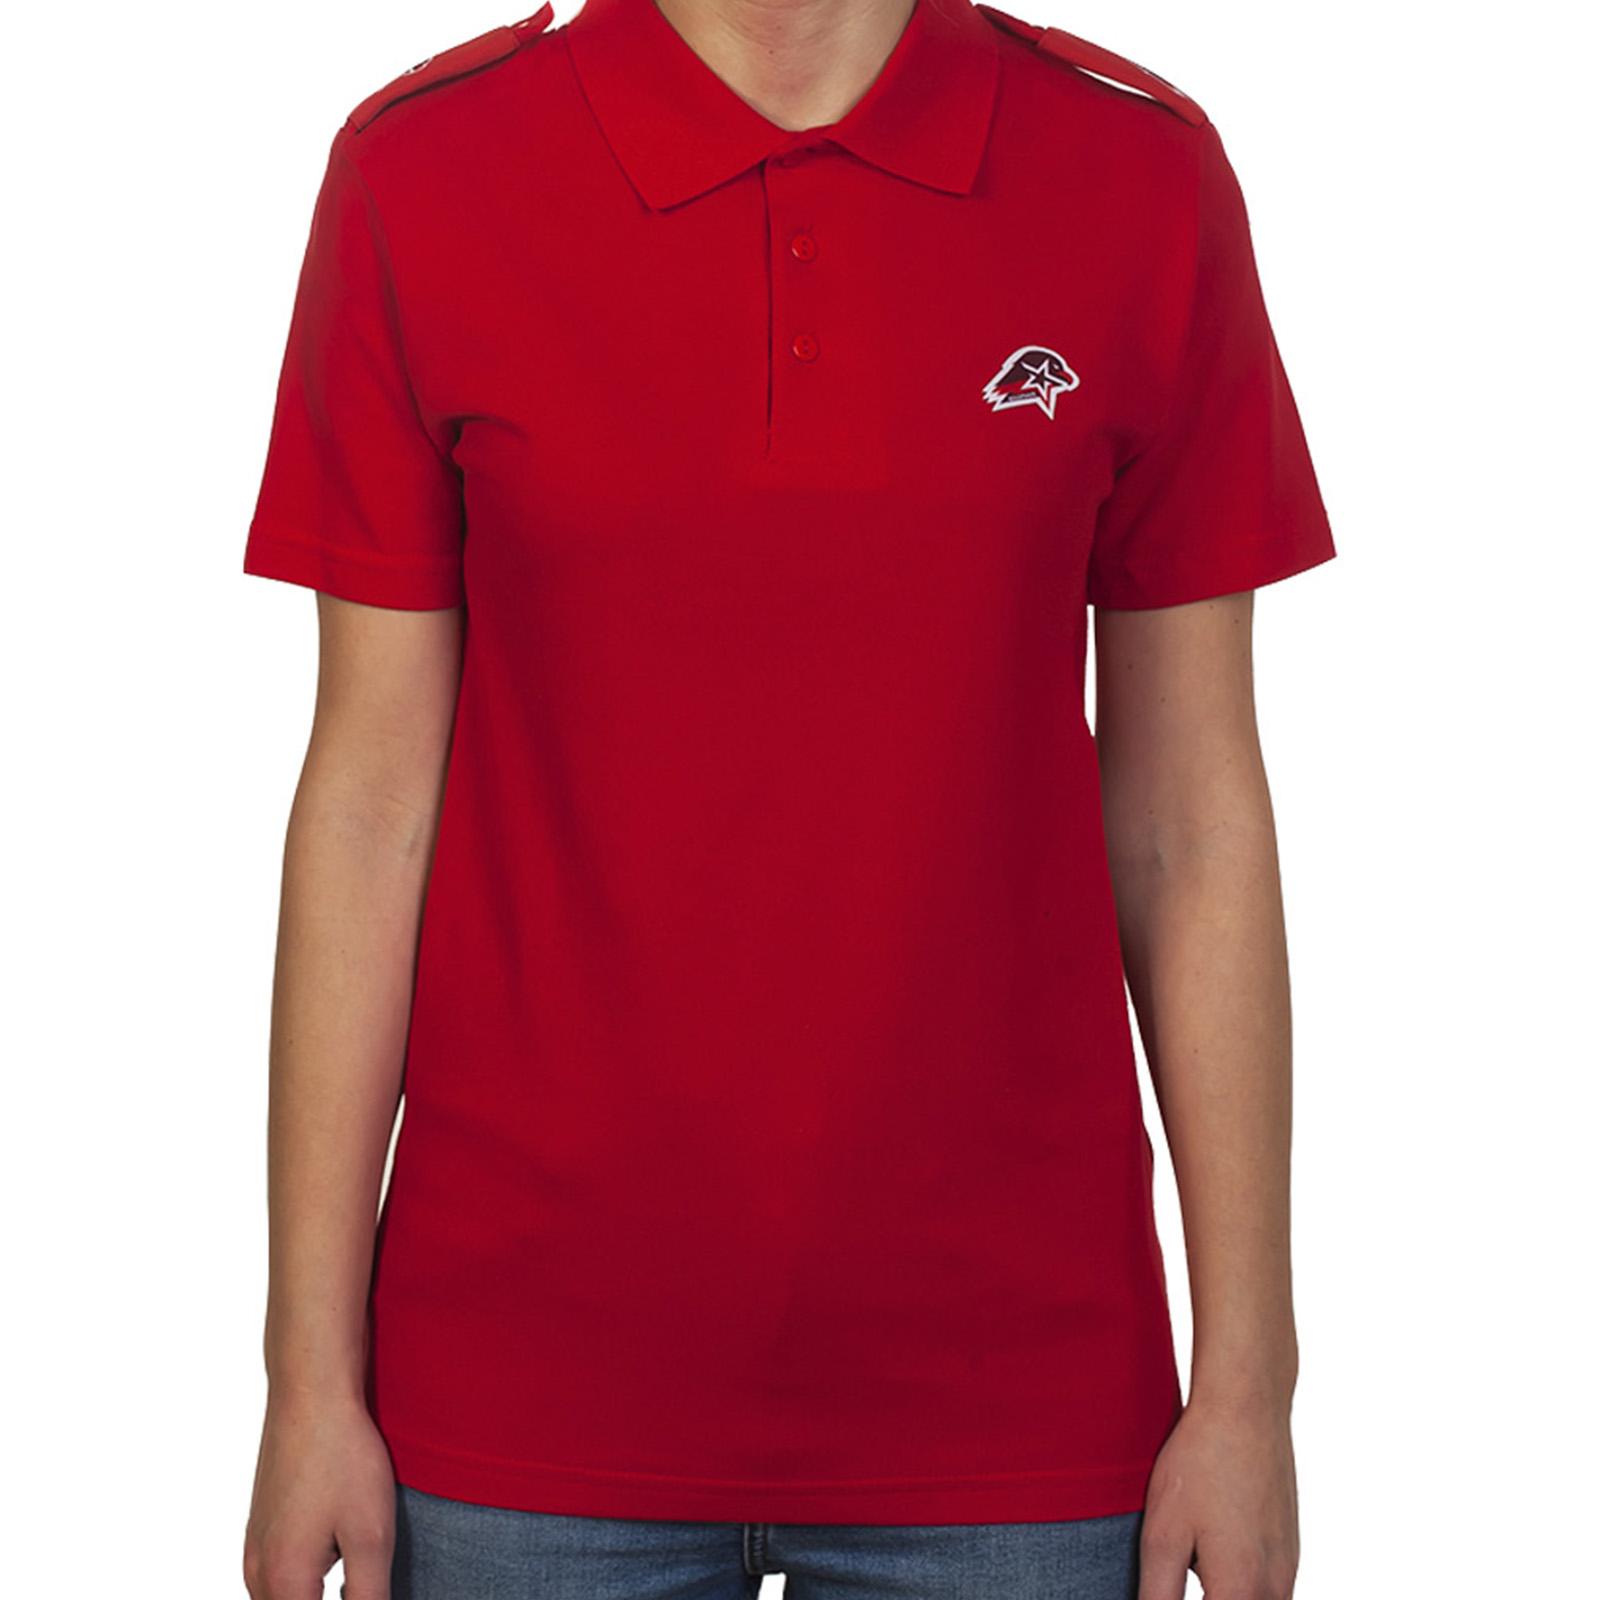 Красная футболка поло с коротким рукавом для юнармейцев